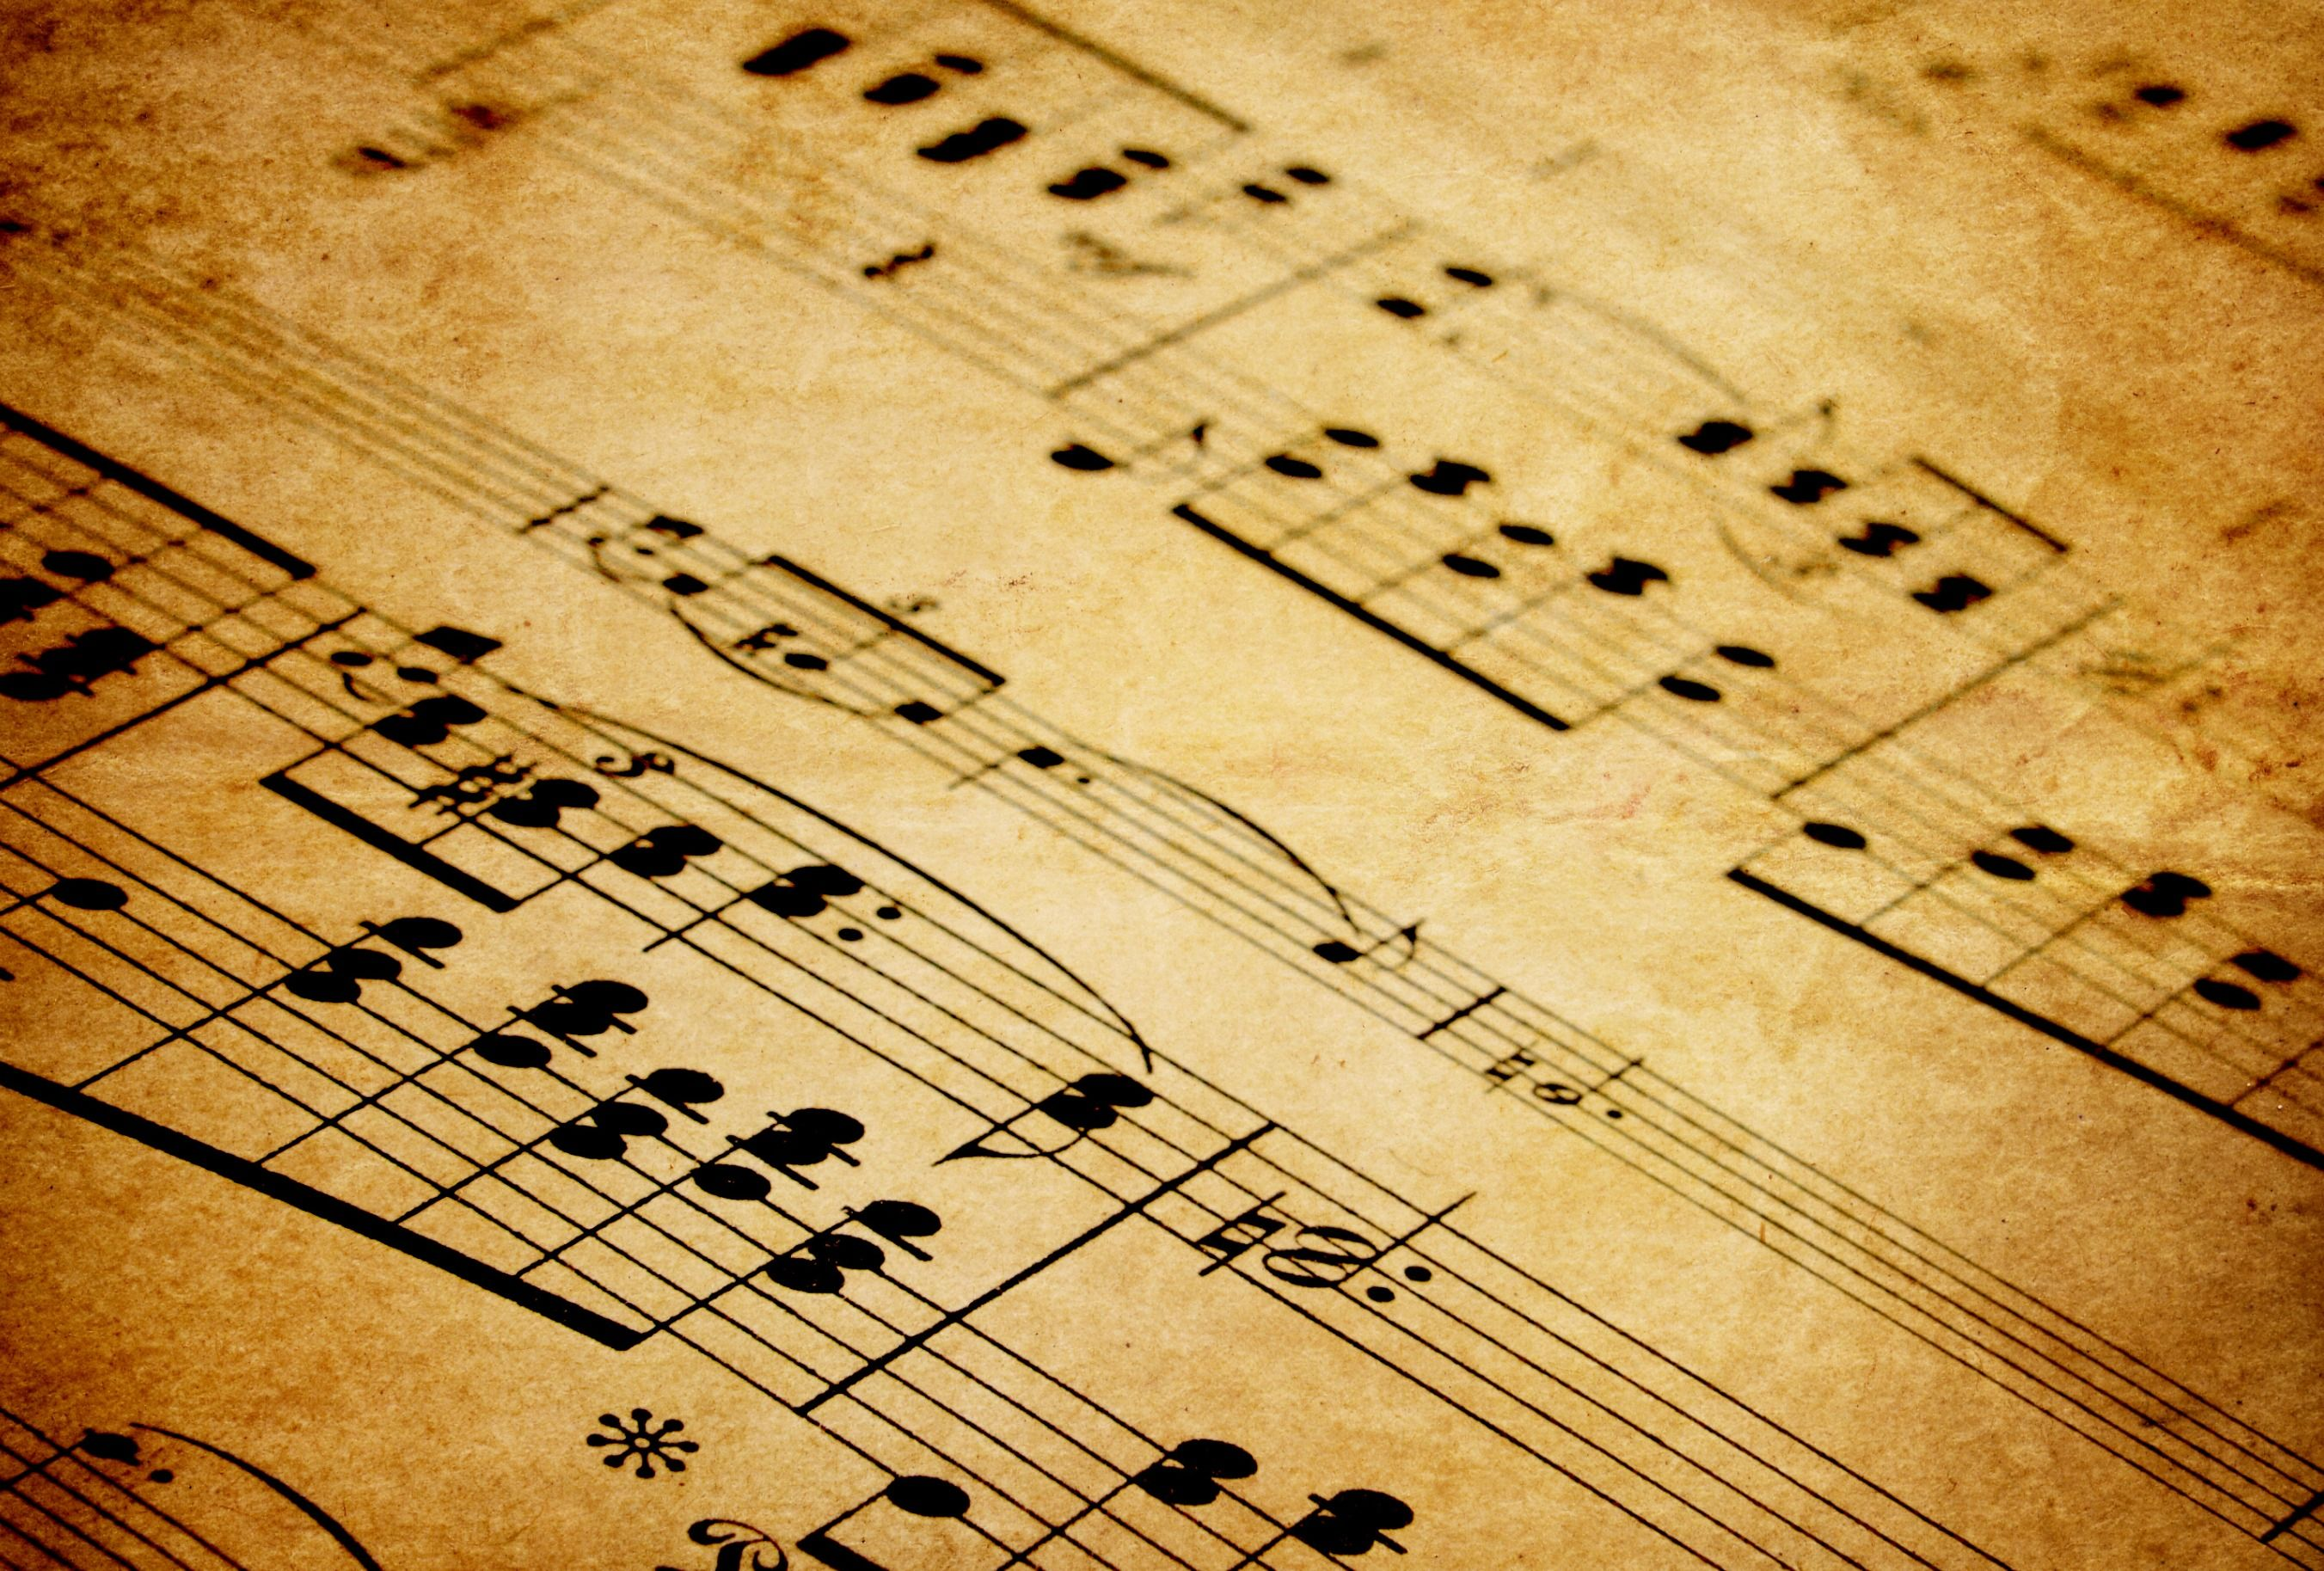 Classic Music Classical Music Music Wallpaper Music Aesthetic